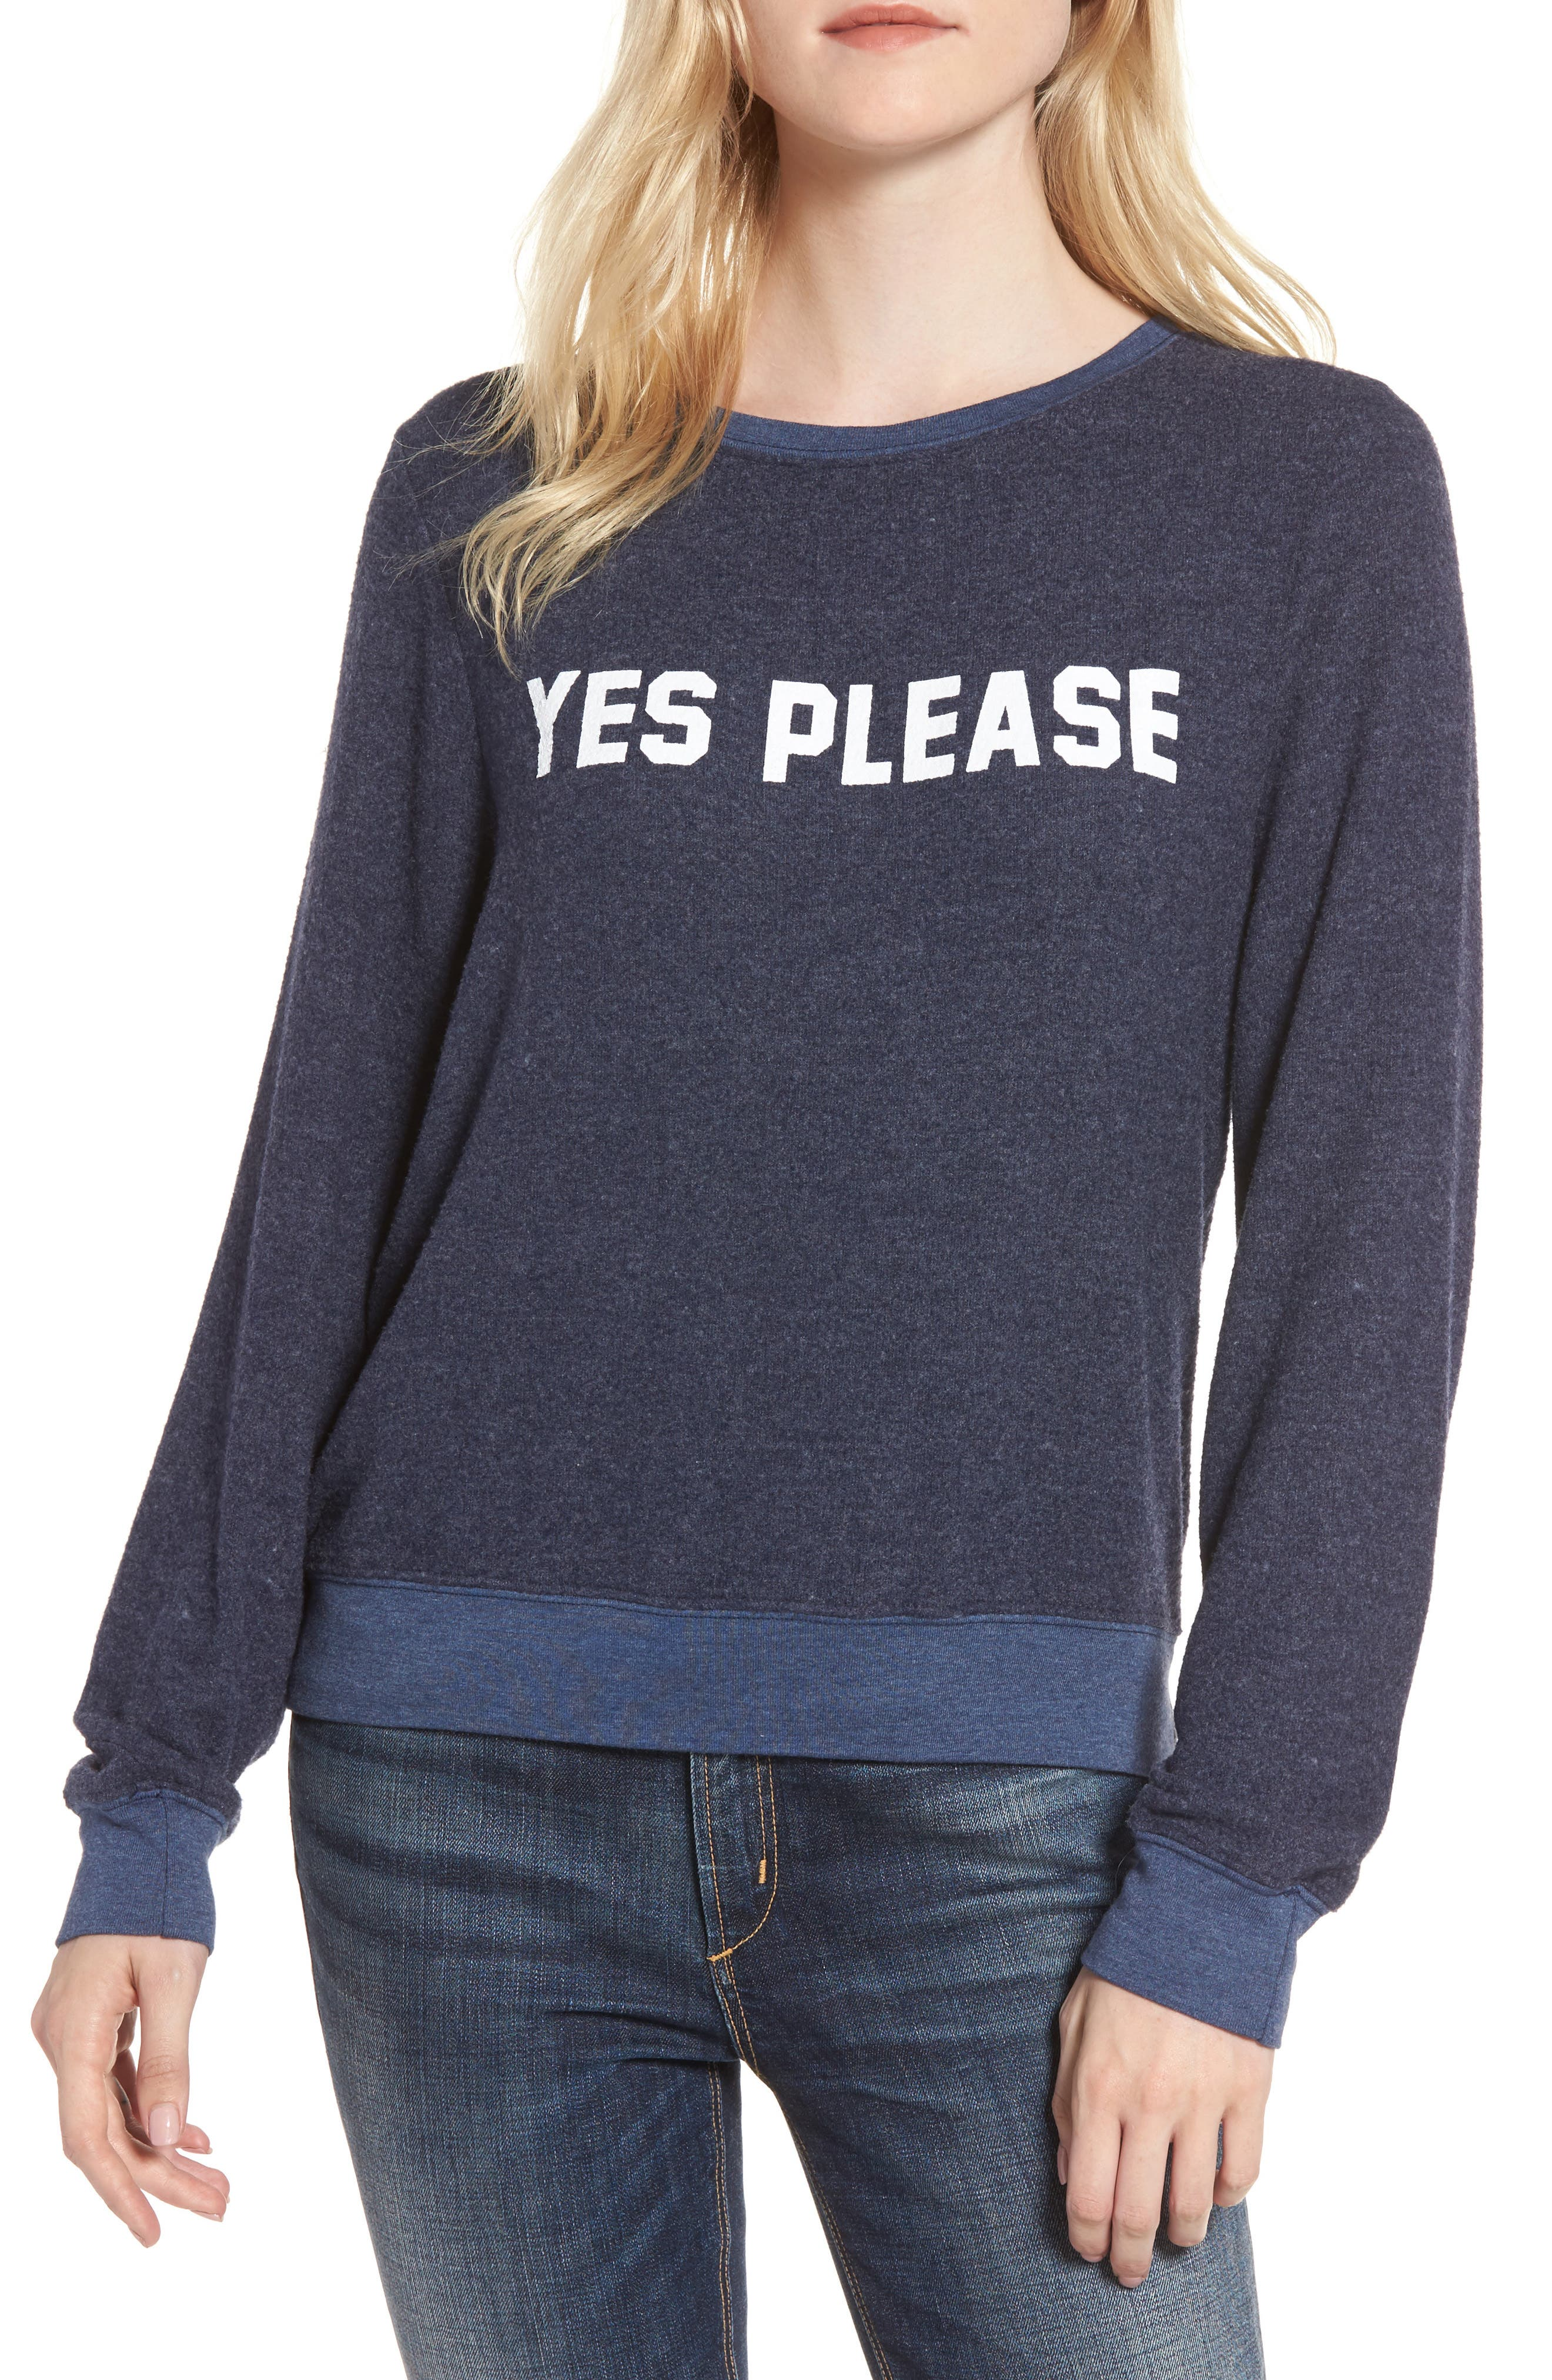 Yes, Please Sweatshirt,                             Main thumbnail 1, color,                             401